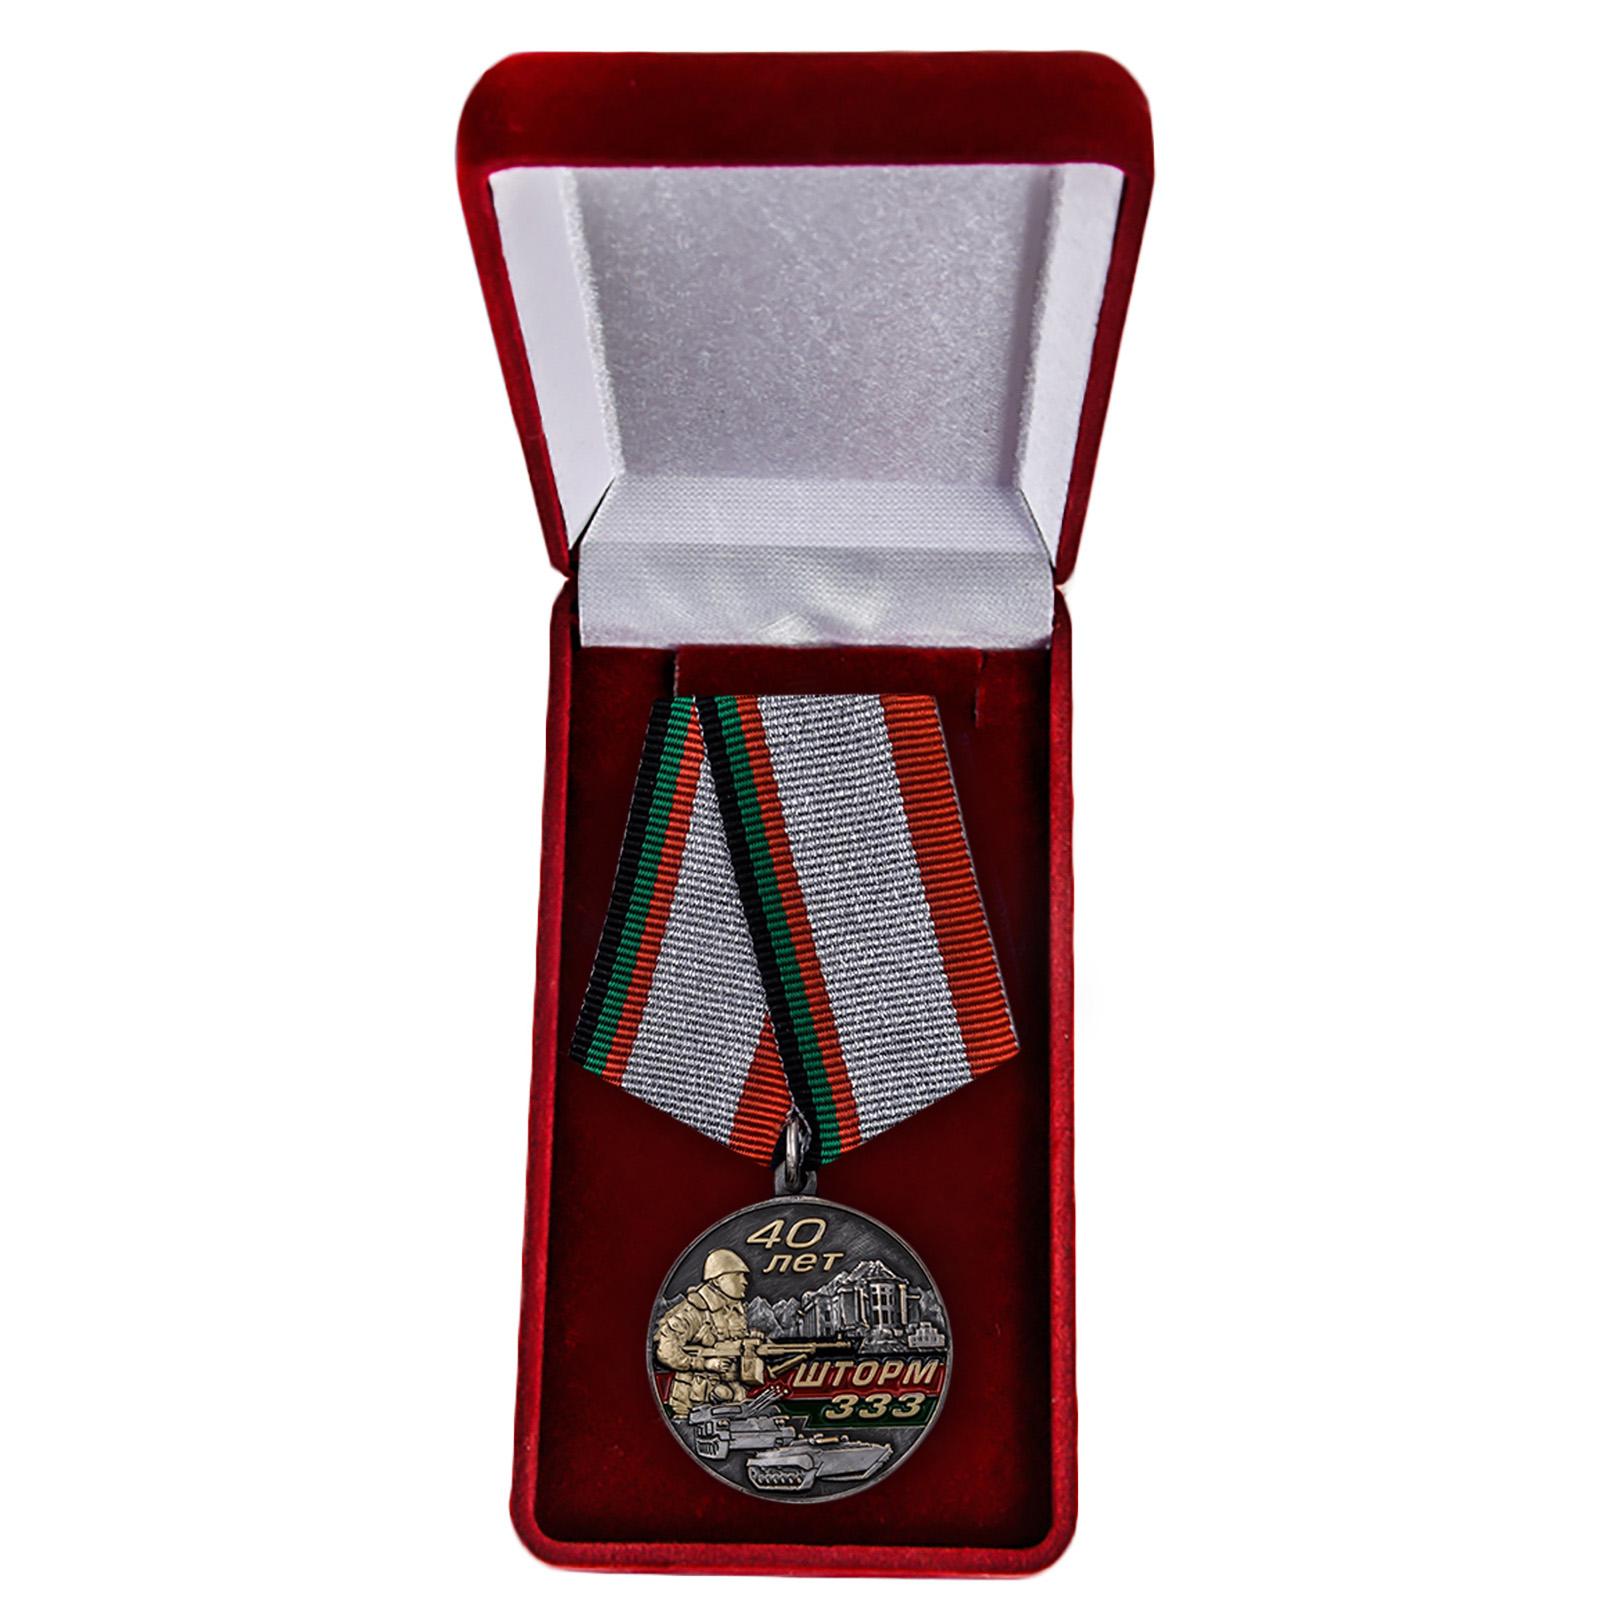 Памятная медаль Афганистан Шторм 333 - в футляре